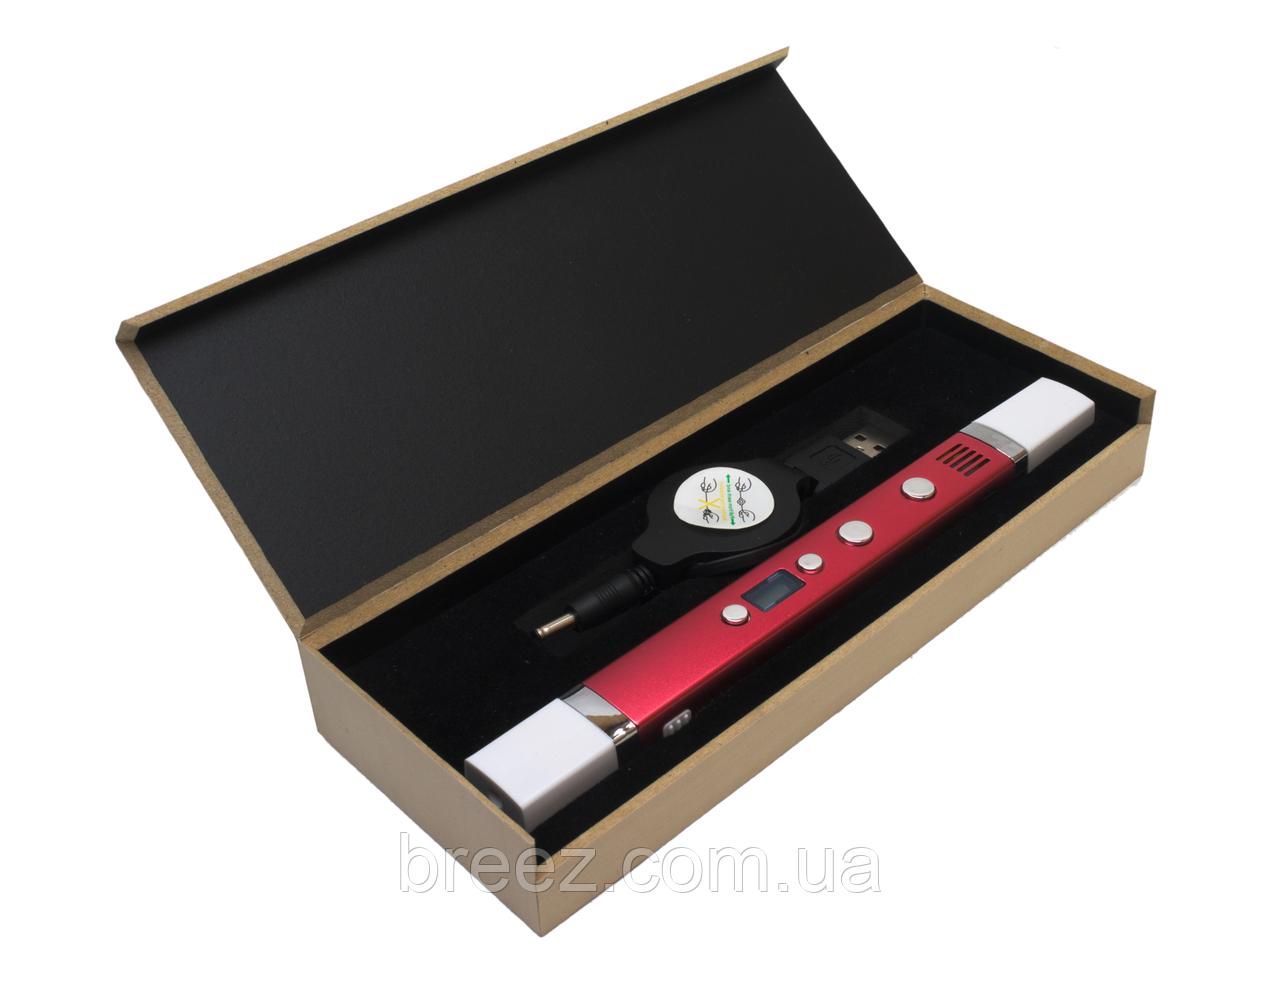 3D Ручка MyRiwell 4 Pro с LCD дисплеем, проволка в комплекте